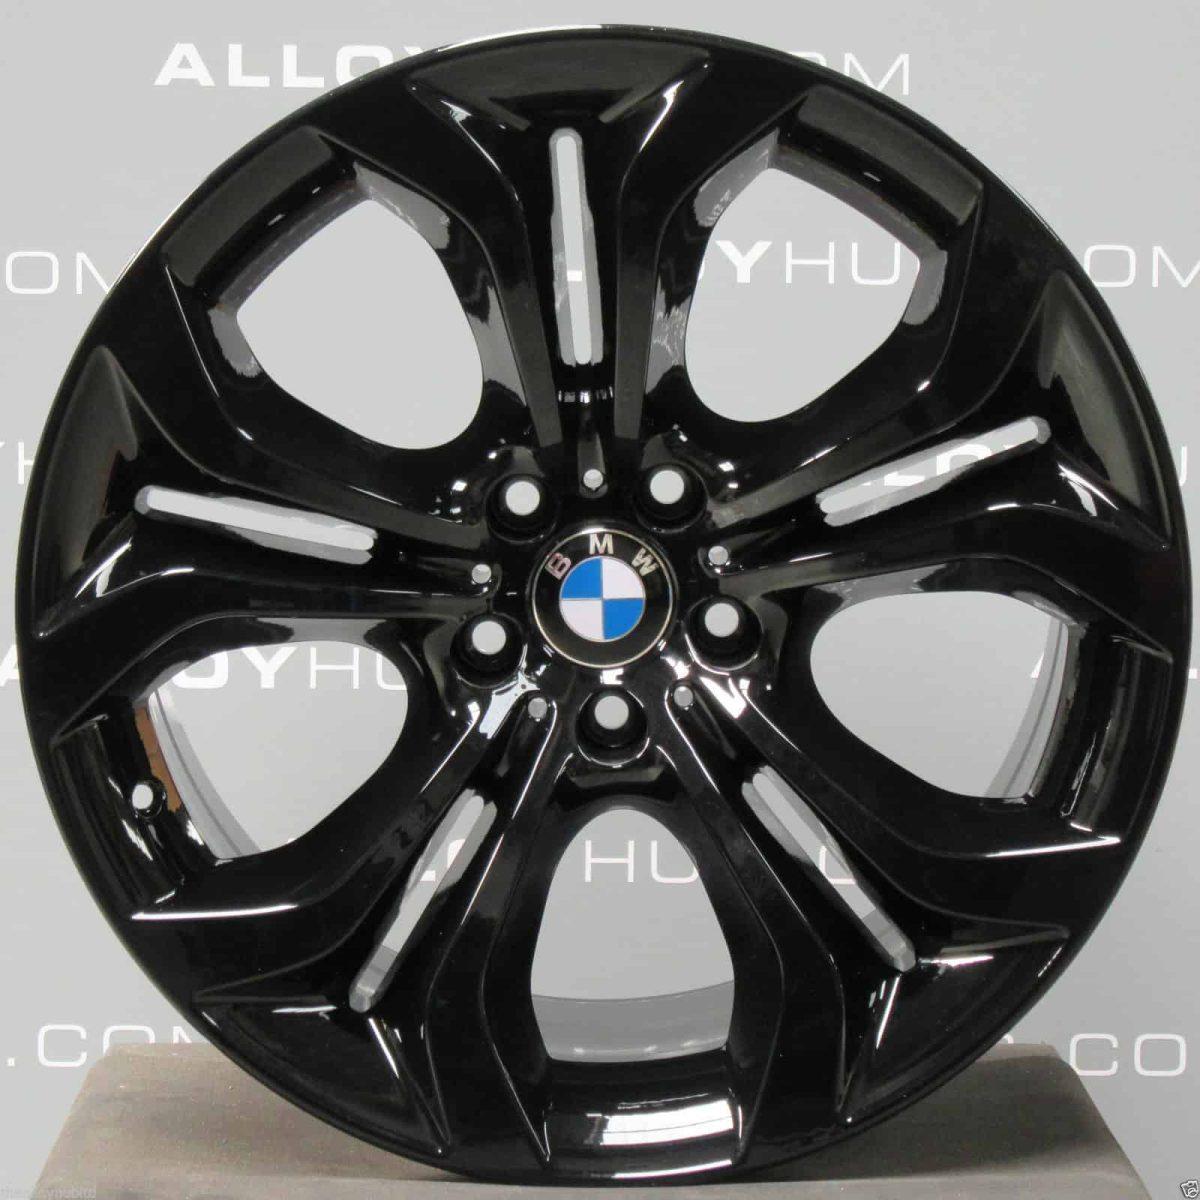 "Genuine BMW X6 E71 E72 336 M Sport Performance 20"" inch Alloy Wheels with Gloss Black Finish 36116788010 36116796152"